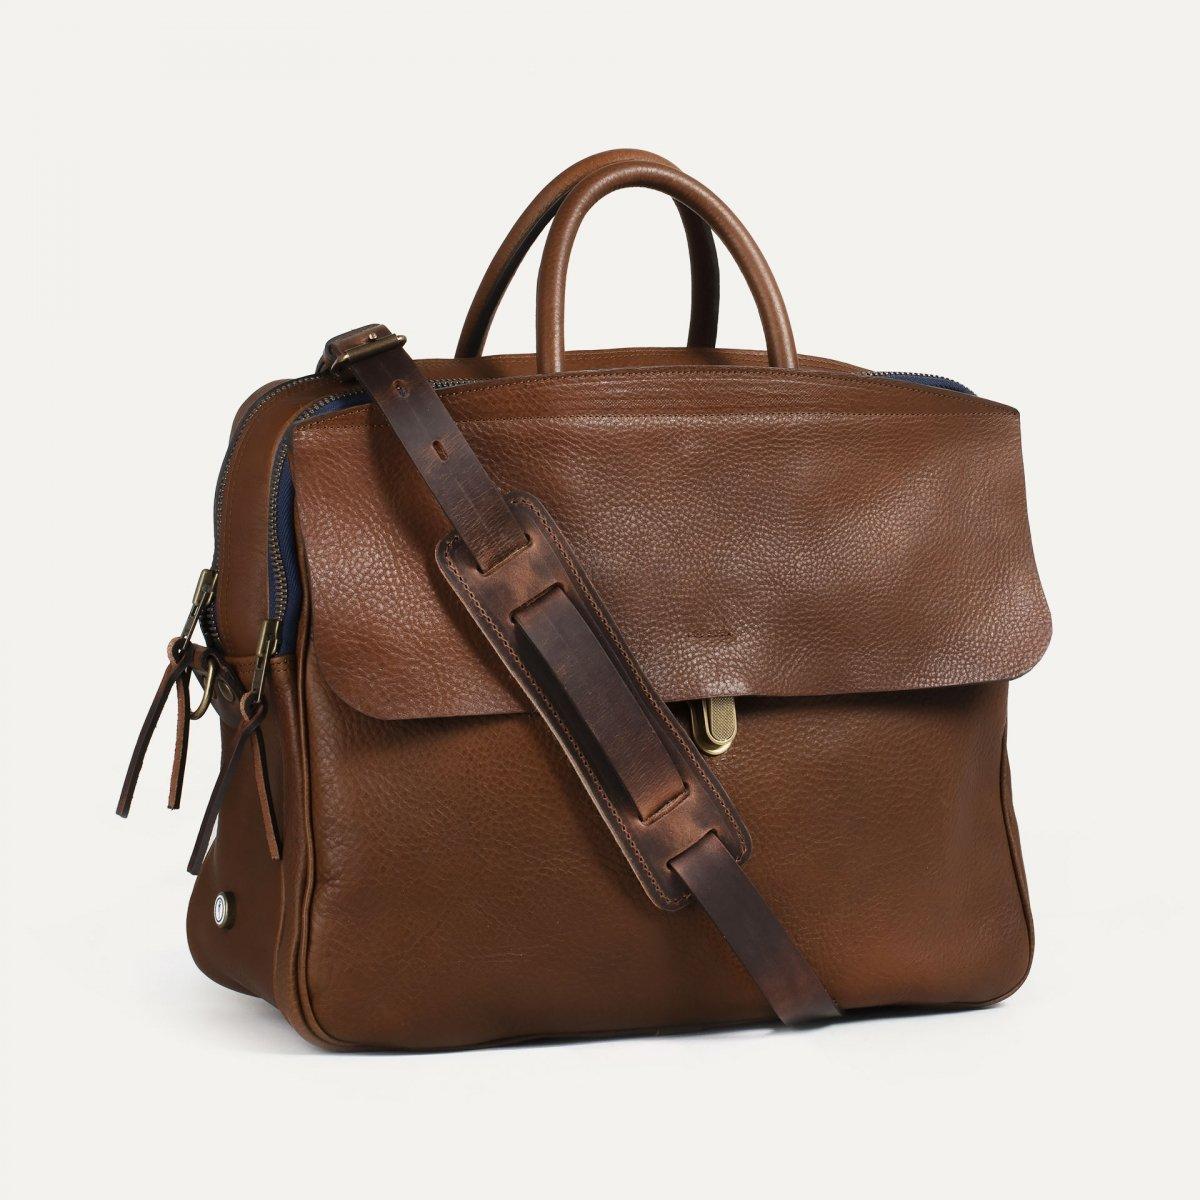 Zeppo Business bag - Cuba Libre / E Pure (image n°2)